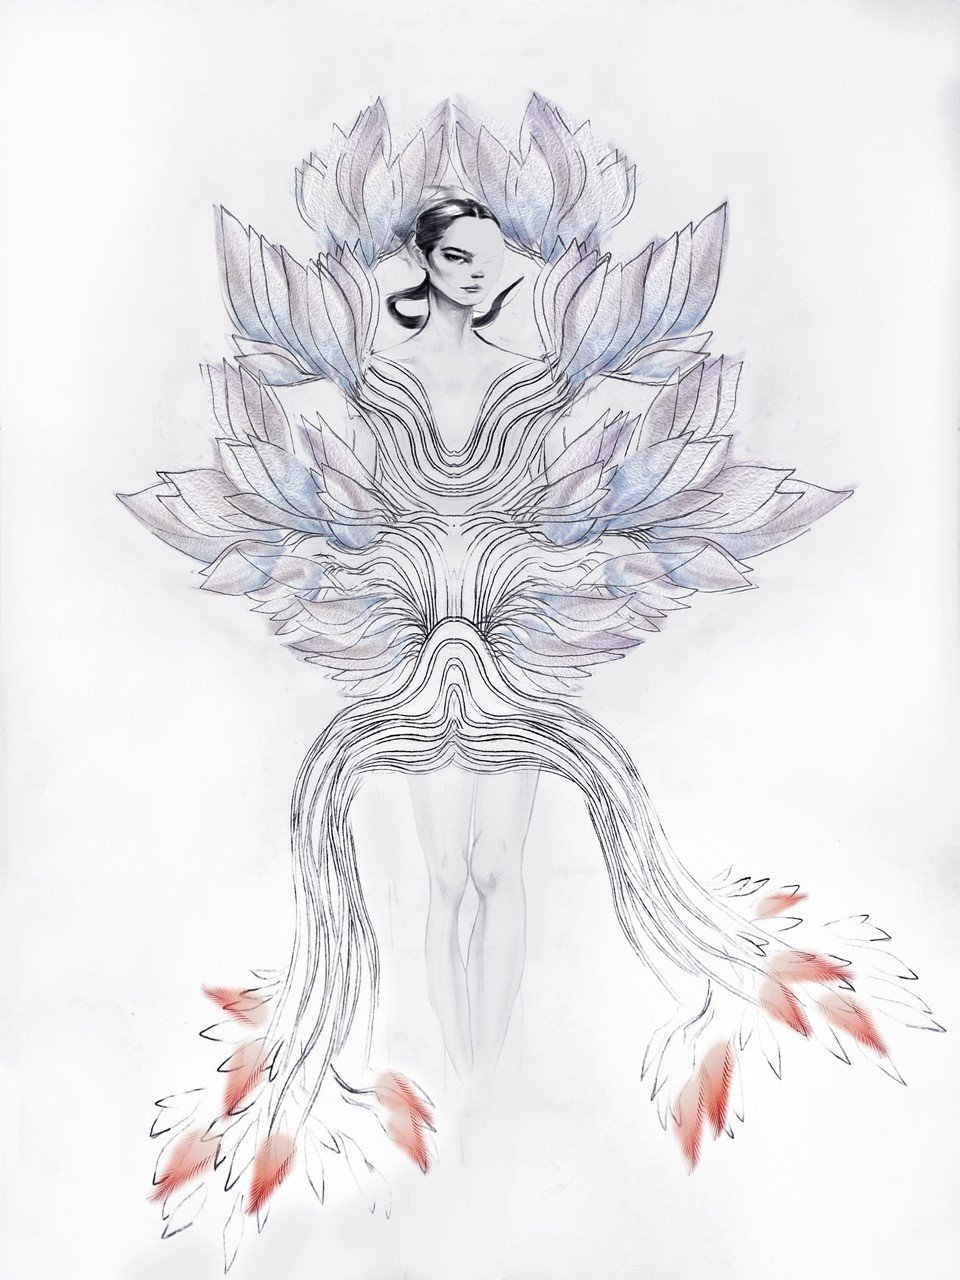 Iris-van-Herpen-making-of-Bjork-Cornucopia-14